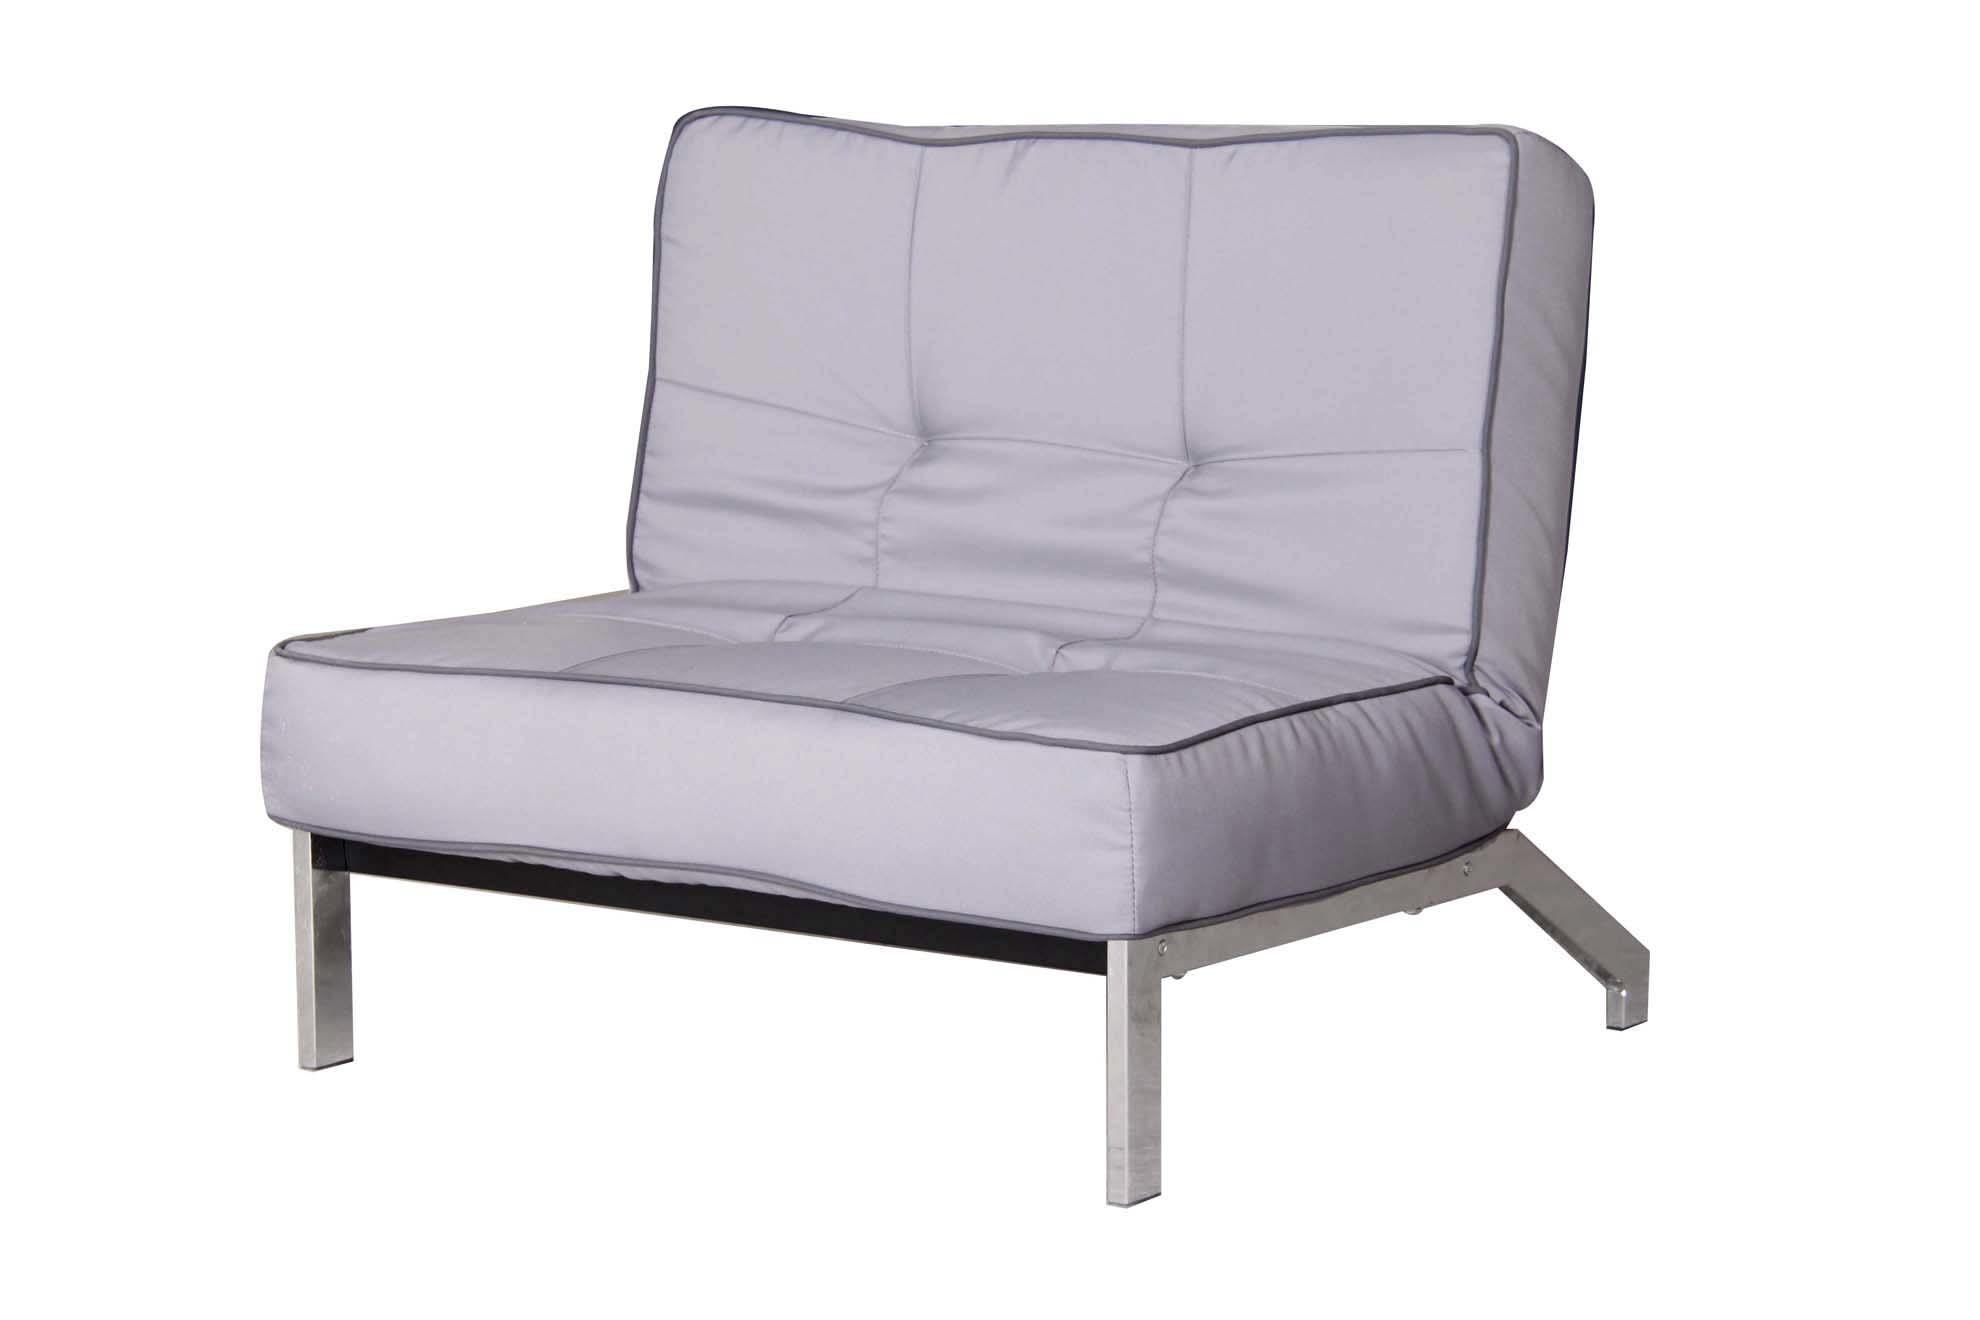 Leisure Fabric Recliner Sofa